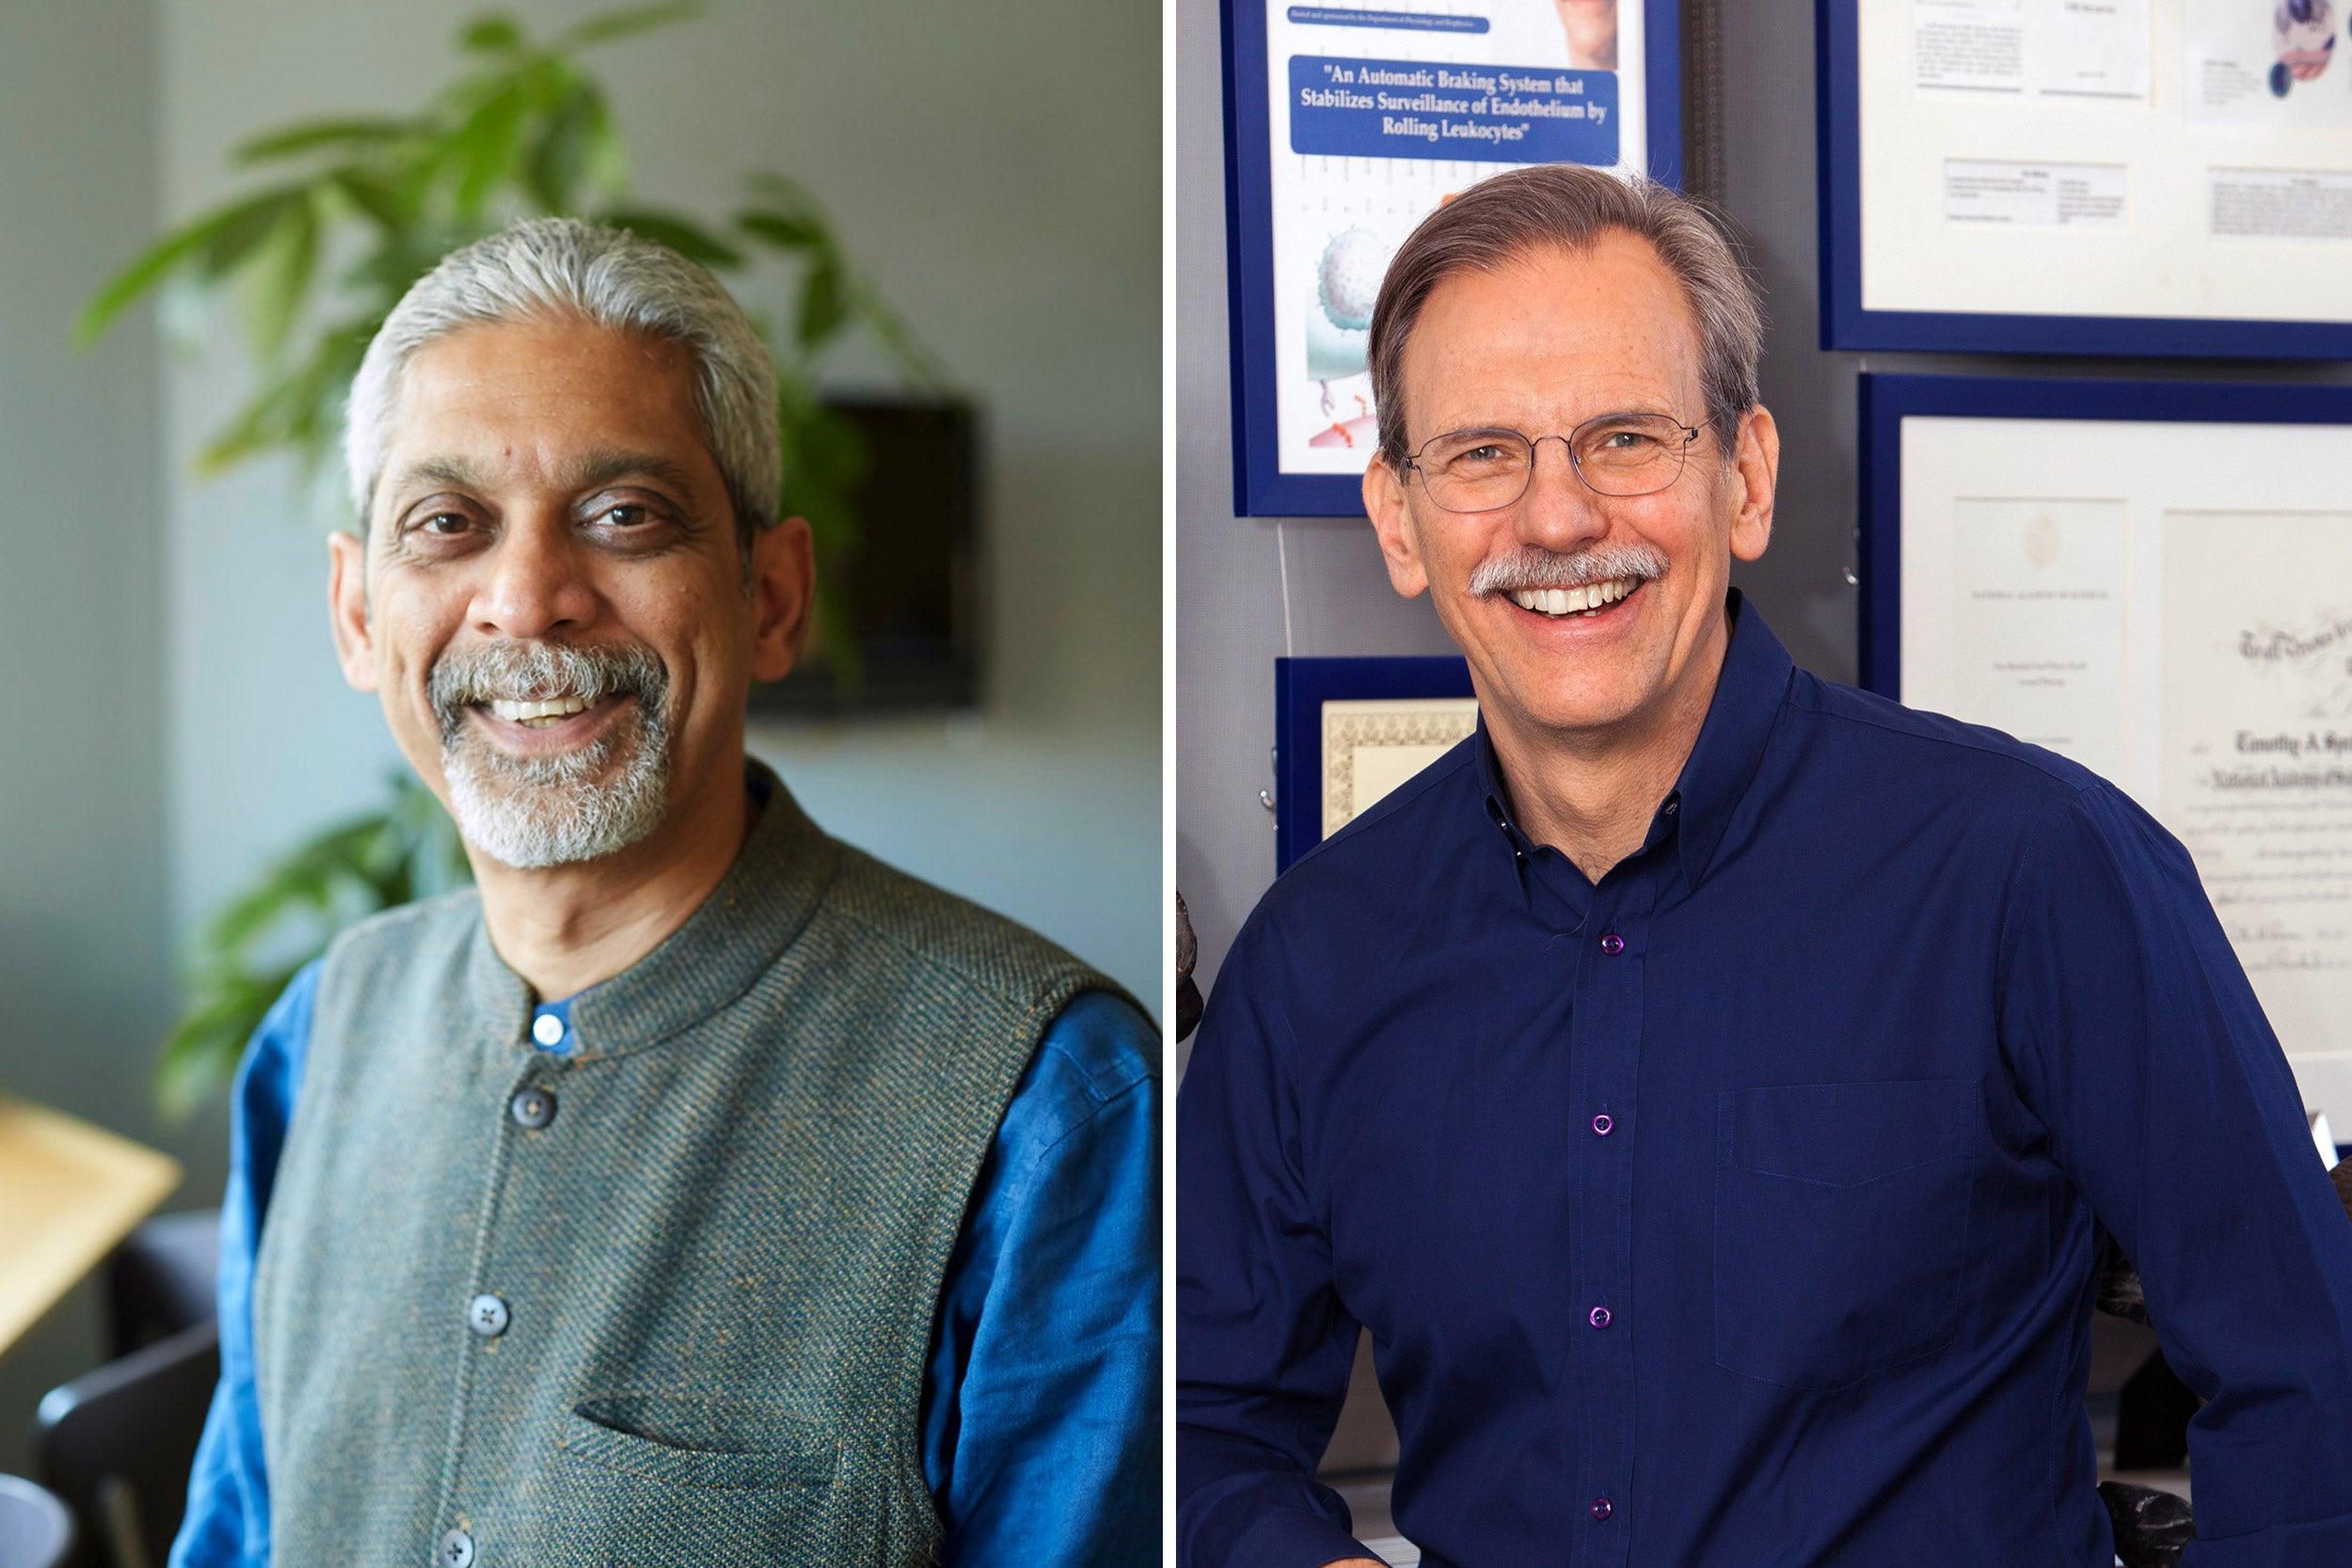 Harvard Medical School researchers Vikram Patel and Timothy Springer, have received the Canada Gairdner Award.